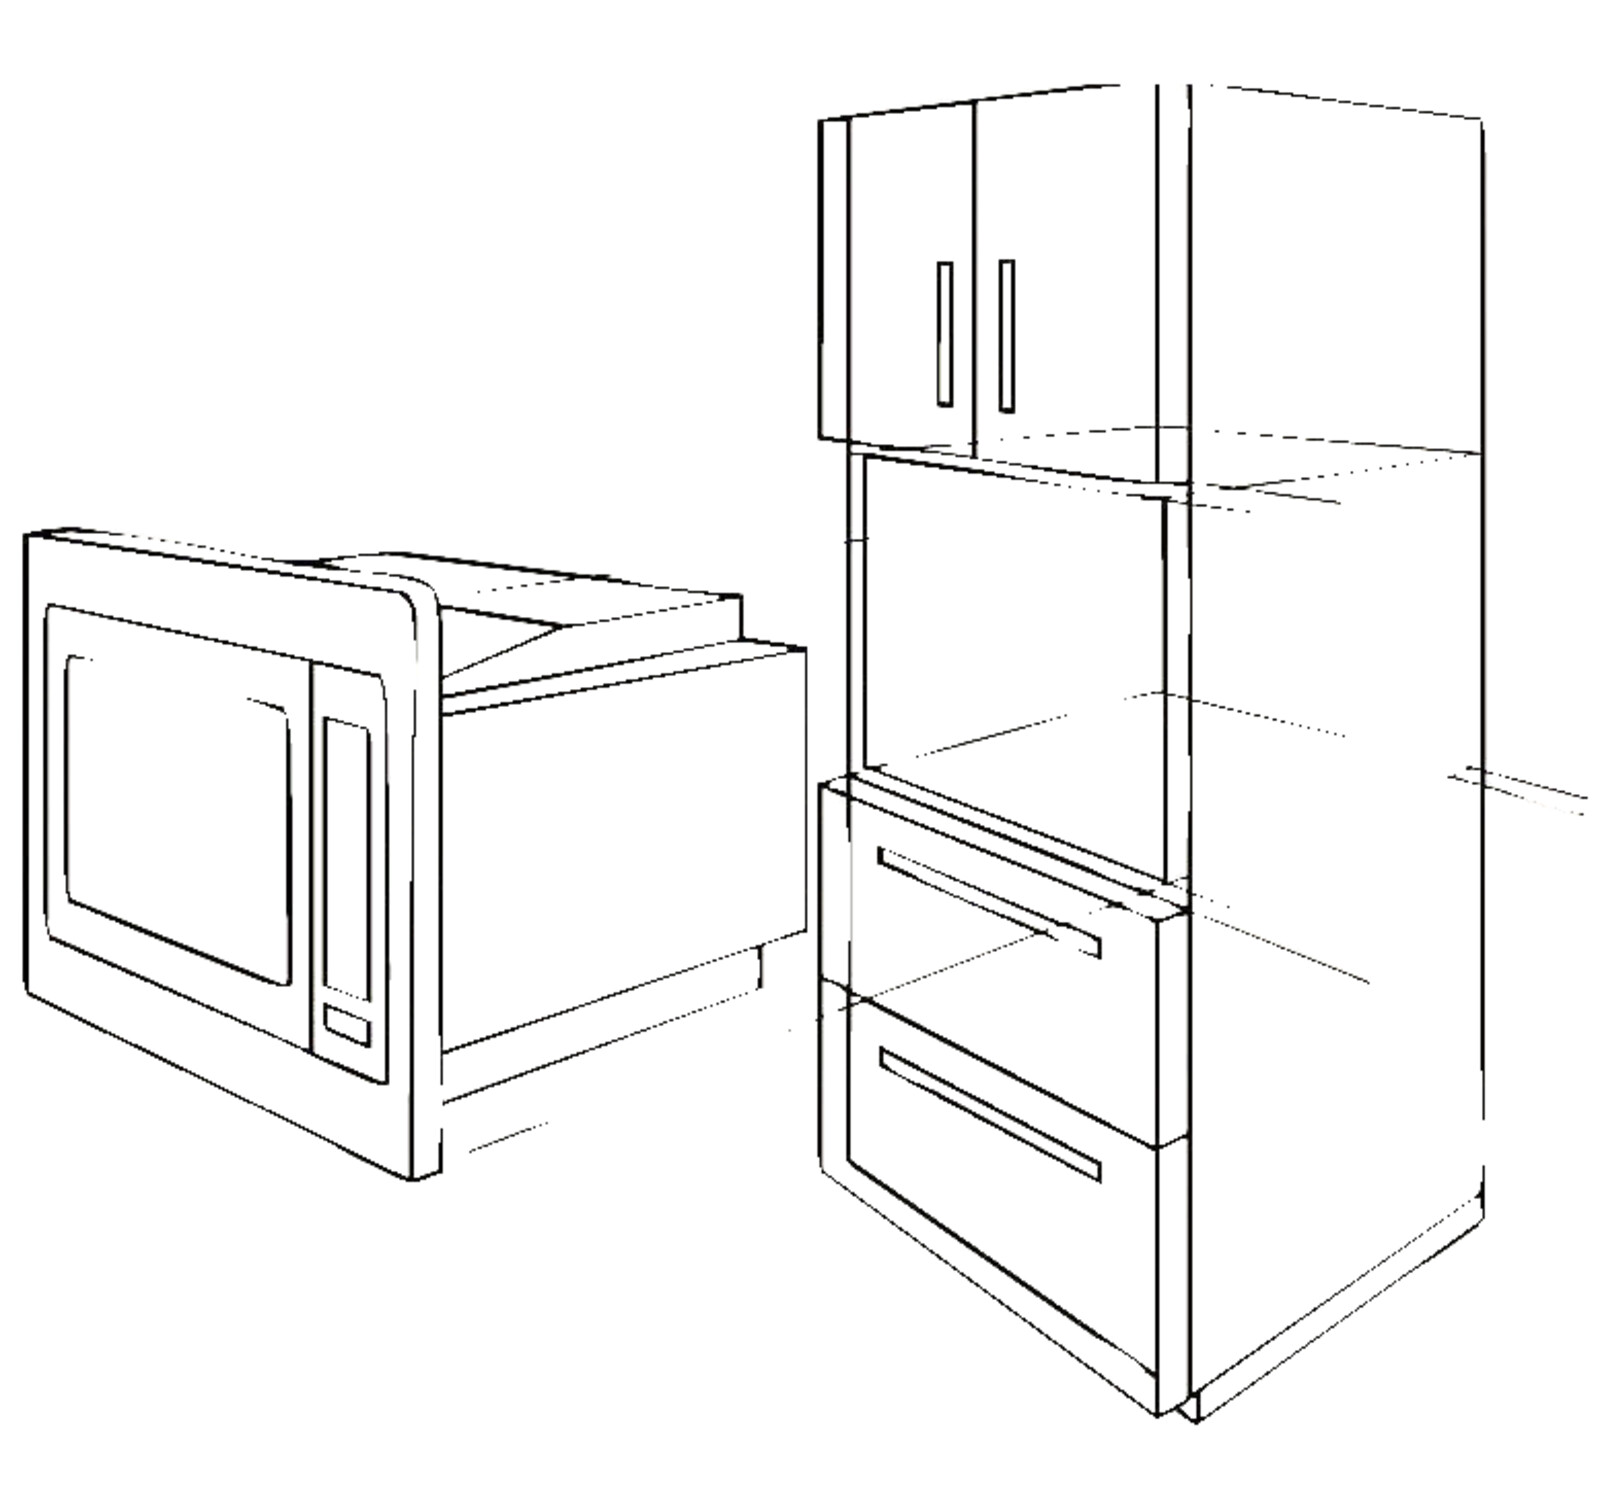 clatronic mwg 2215 eb mikrowelle 800 watt. Black Bedroom Furniture Sets. Home Design Ideas